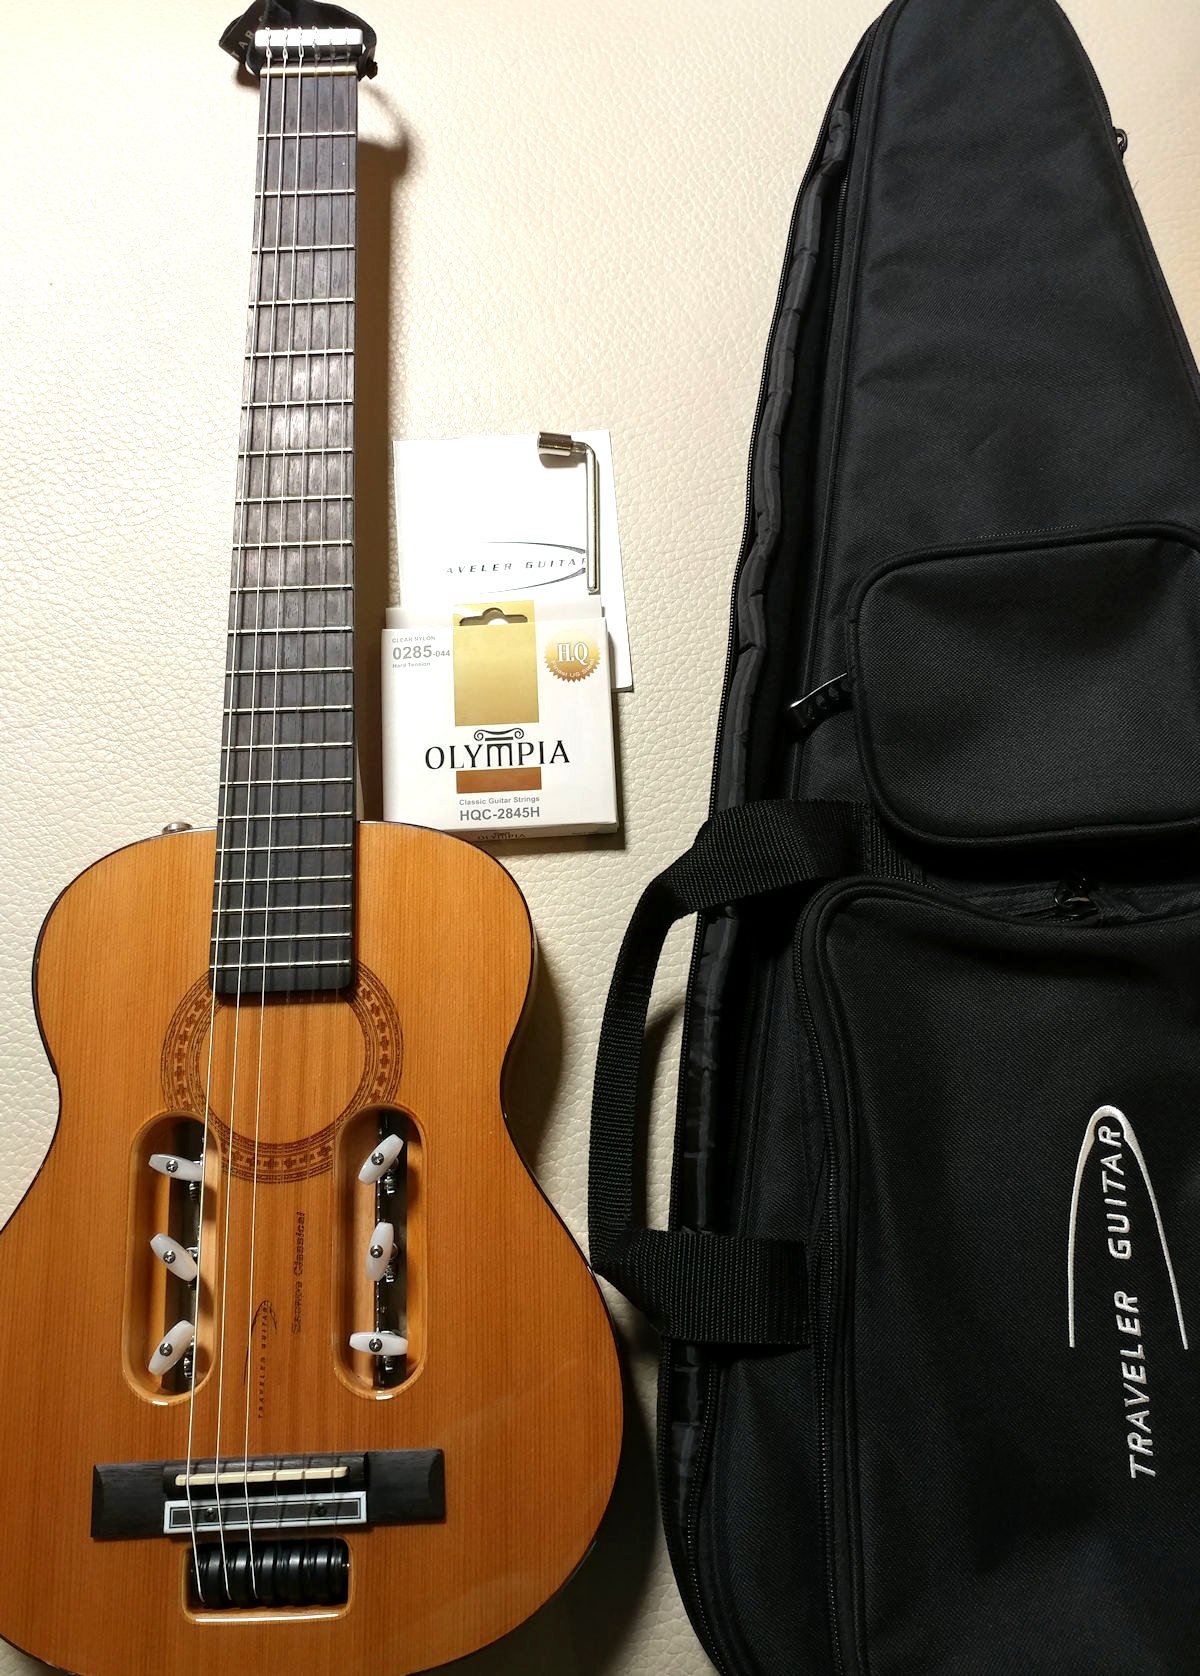 traveler_guitar_photo_1.jpg